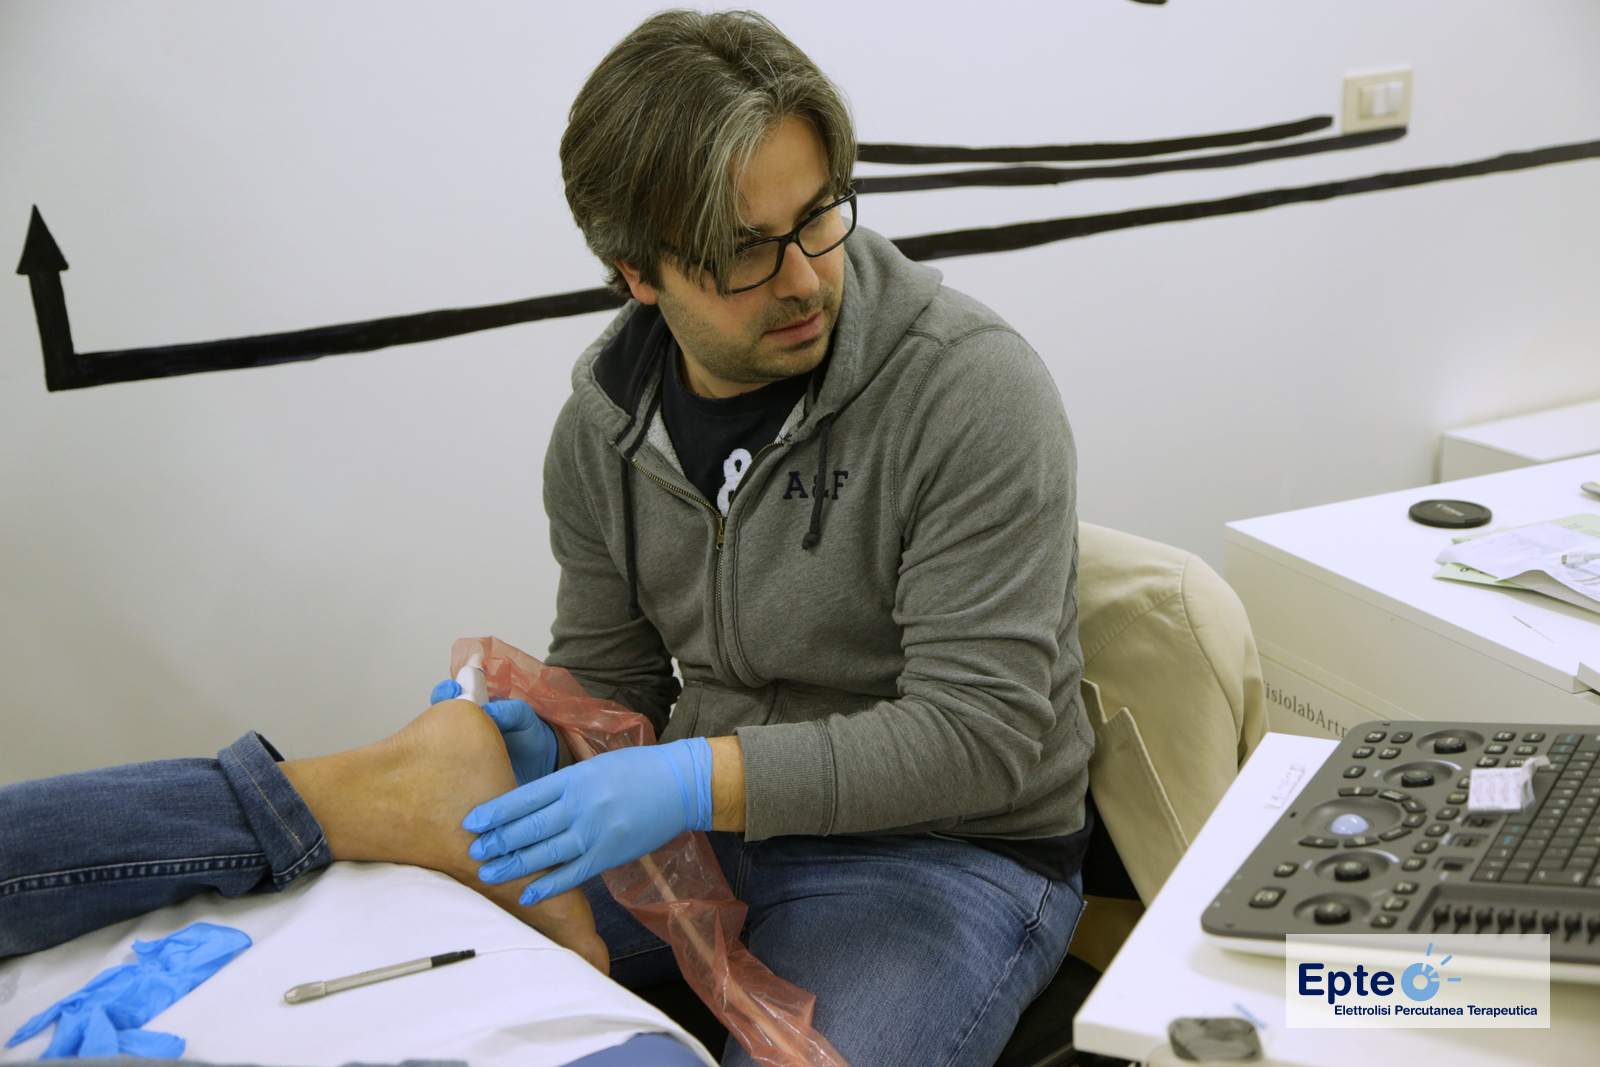 marco-di-gesu-epte-tratamiento-epte